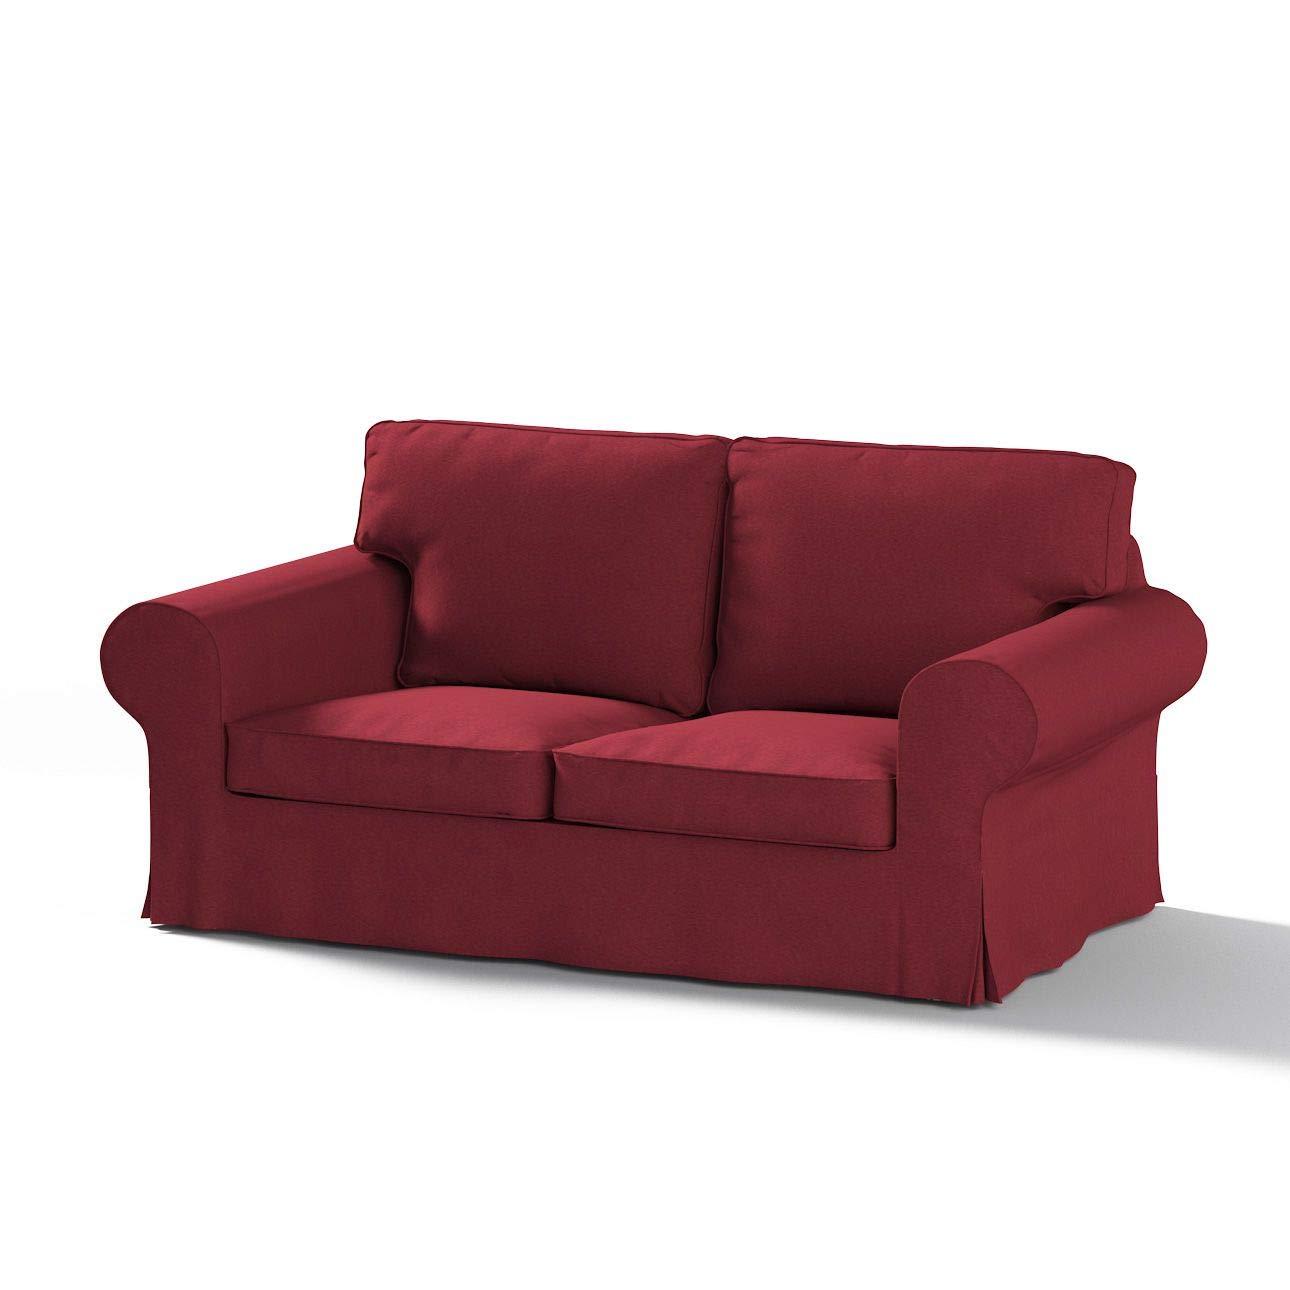 Window Treatments Dekoria Custom Made Ikea Karlstad Sofa Bed Cover